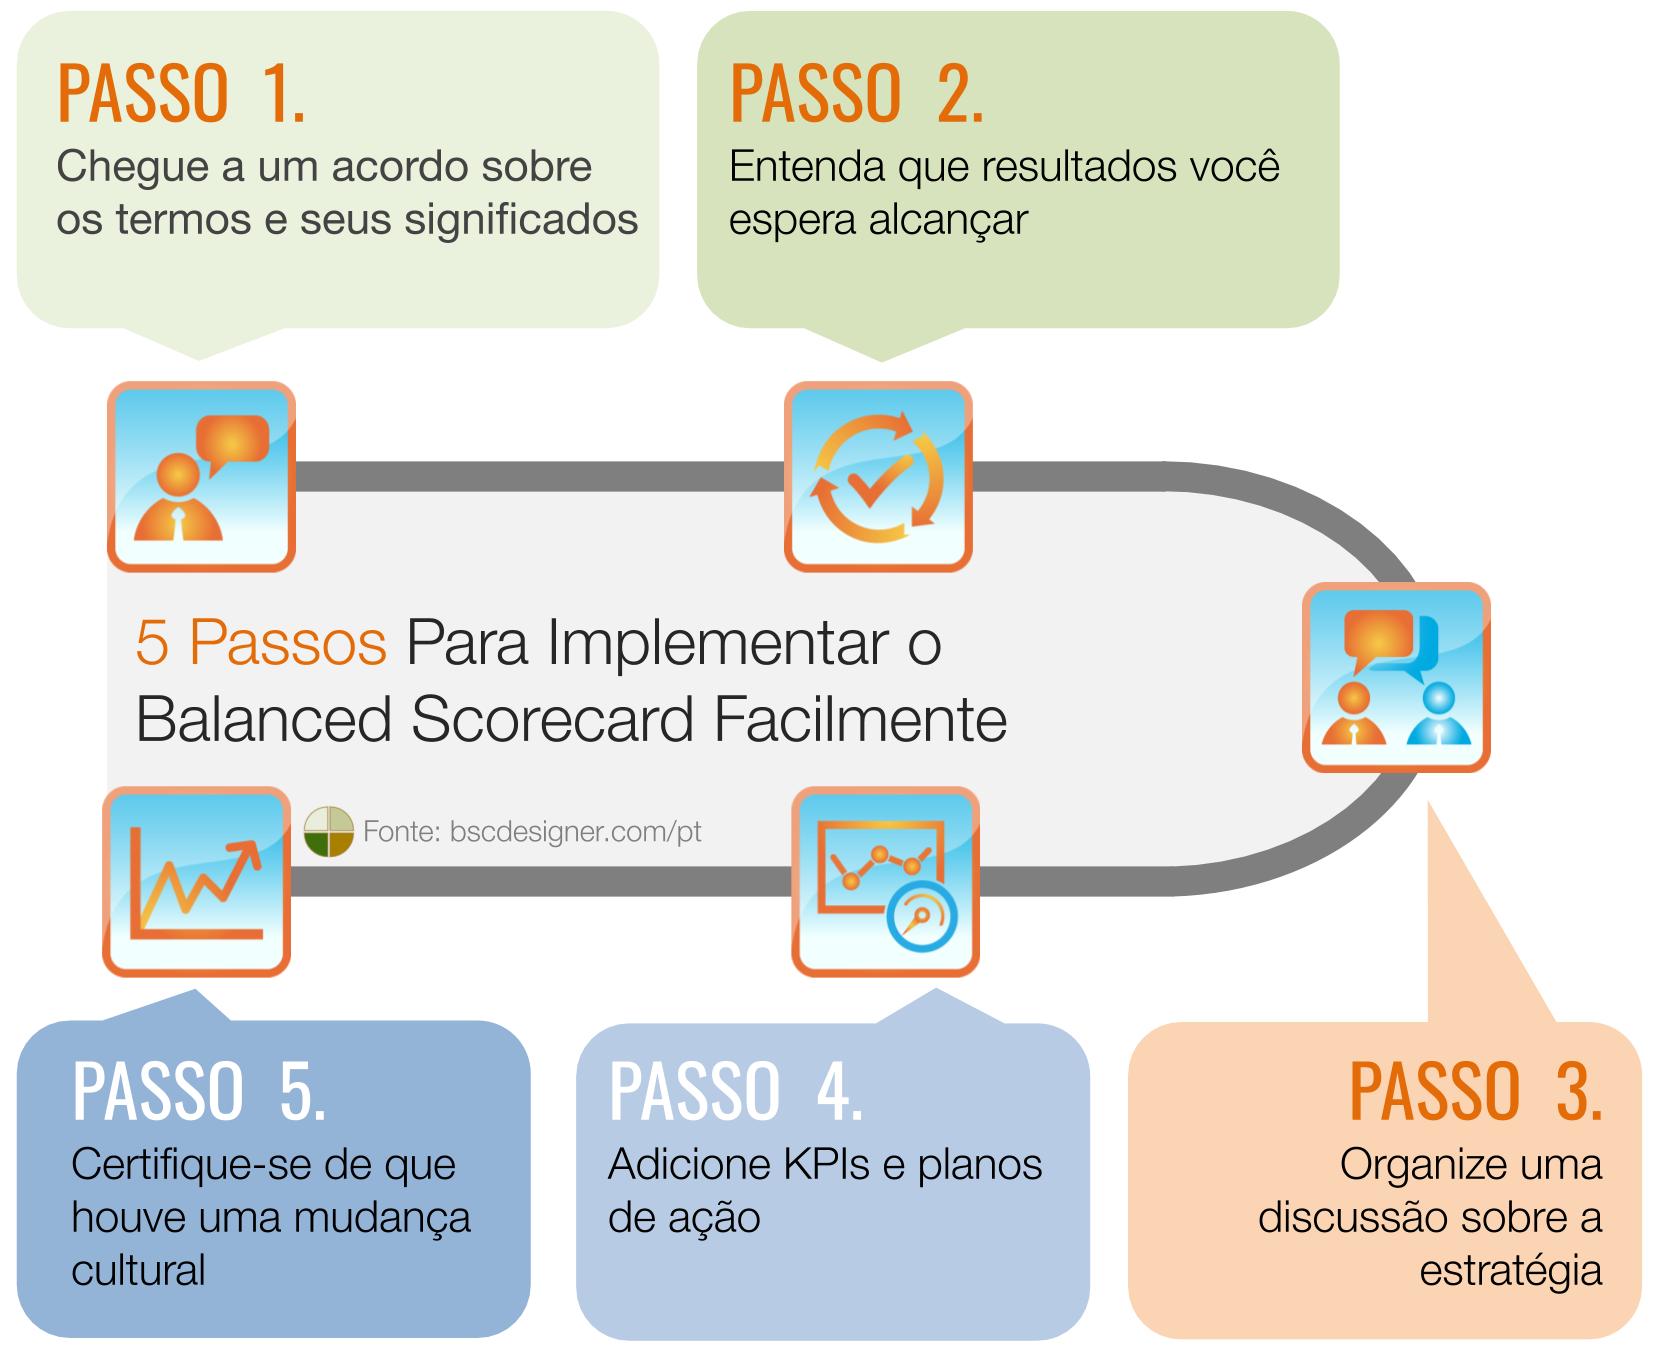 5 Passos Para Implementar o Balanced Scorecard Facilmente